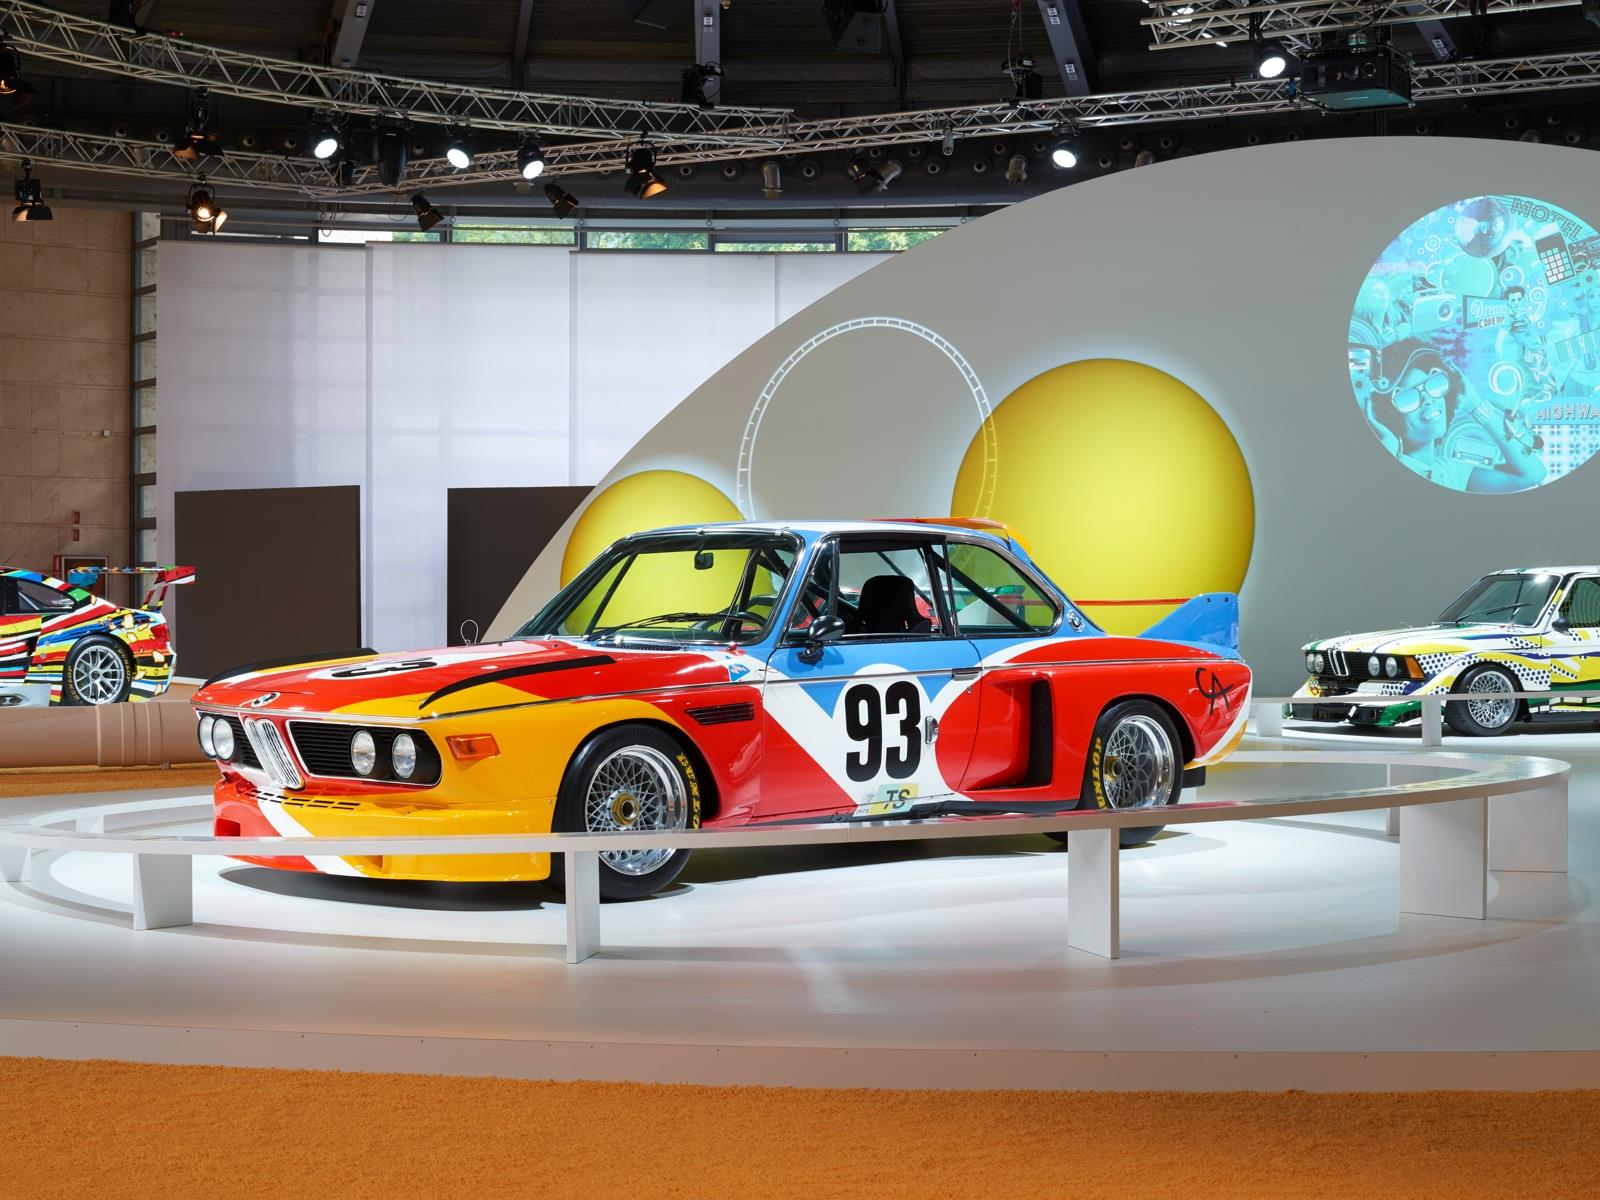 GAZ_273d3225f135449fb8df71a50666bc25 Cool Bmw Z1 Joyas sobre Ruedas Cars Trend